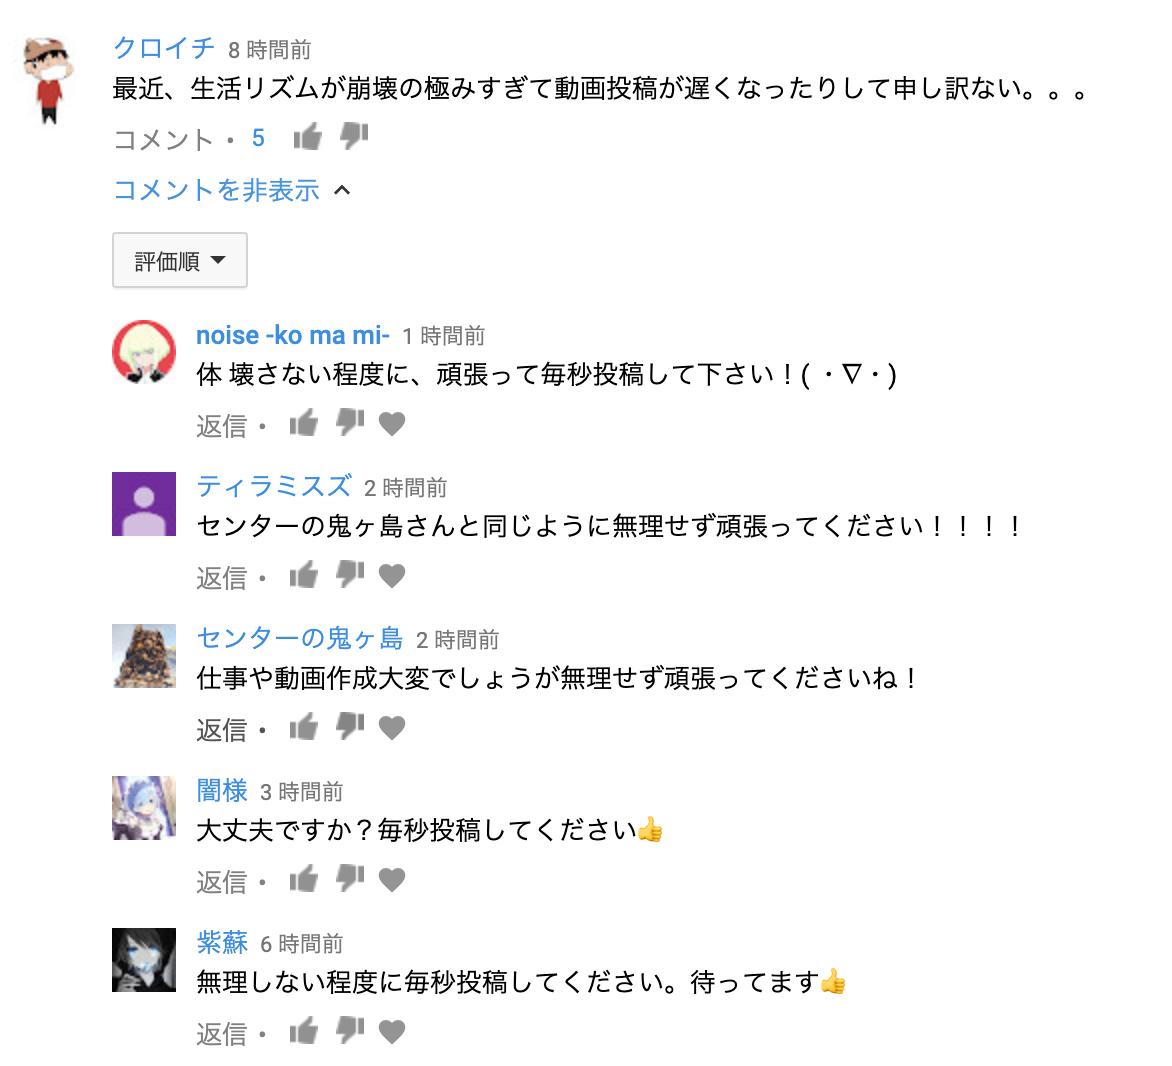 f:id:kuroichi-201:20190710093739p:plain